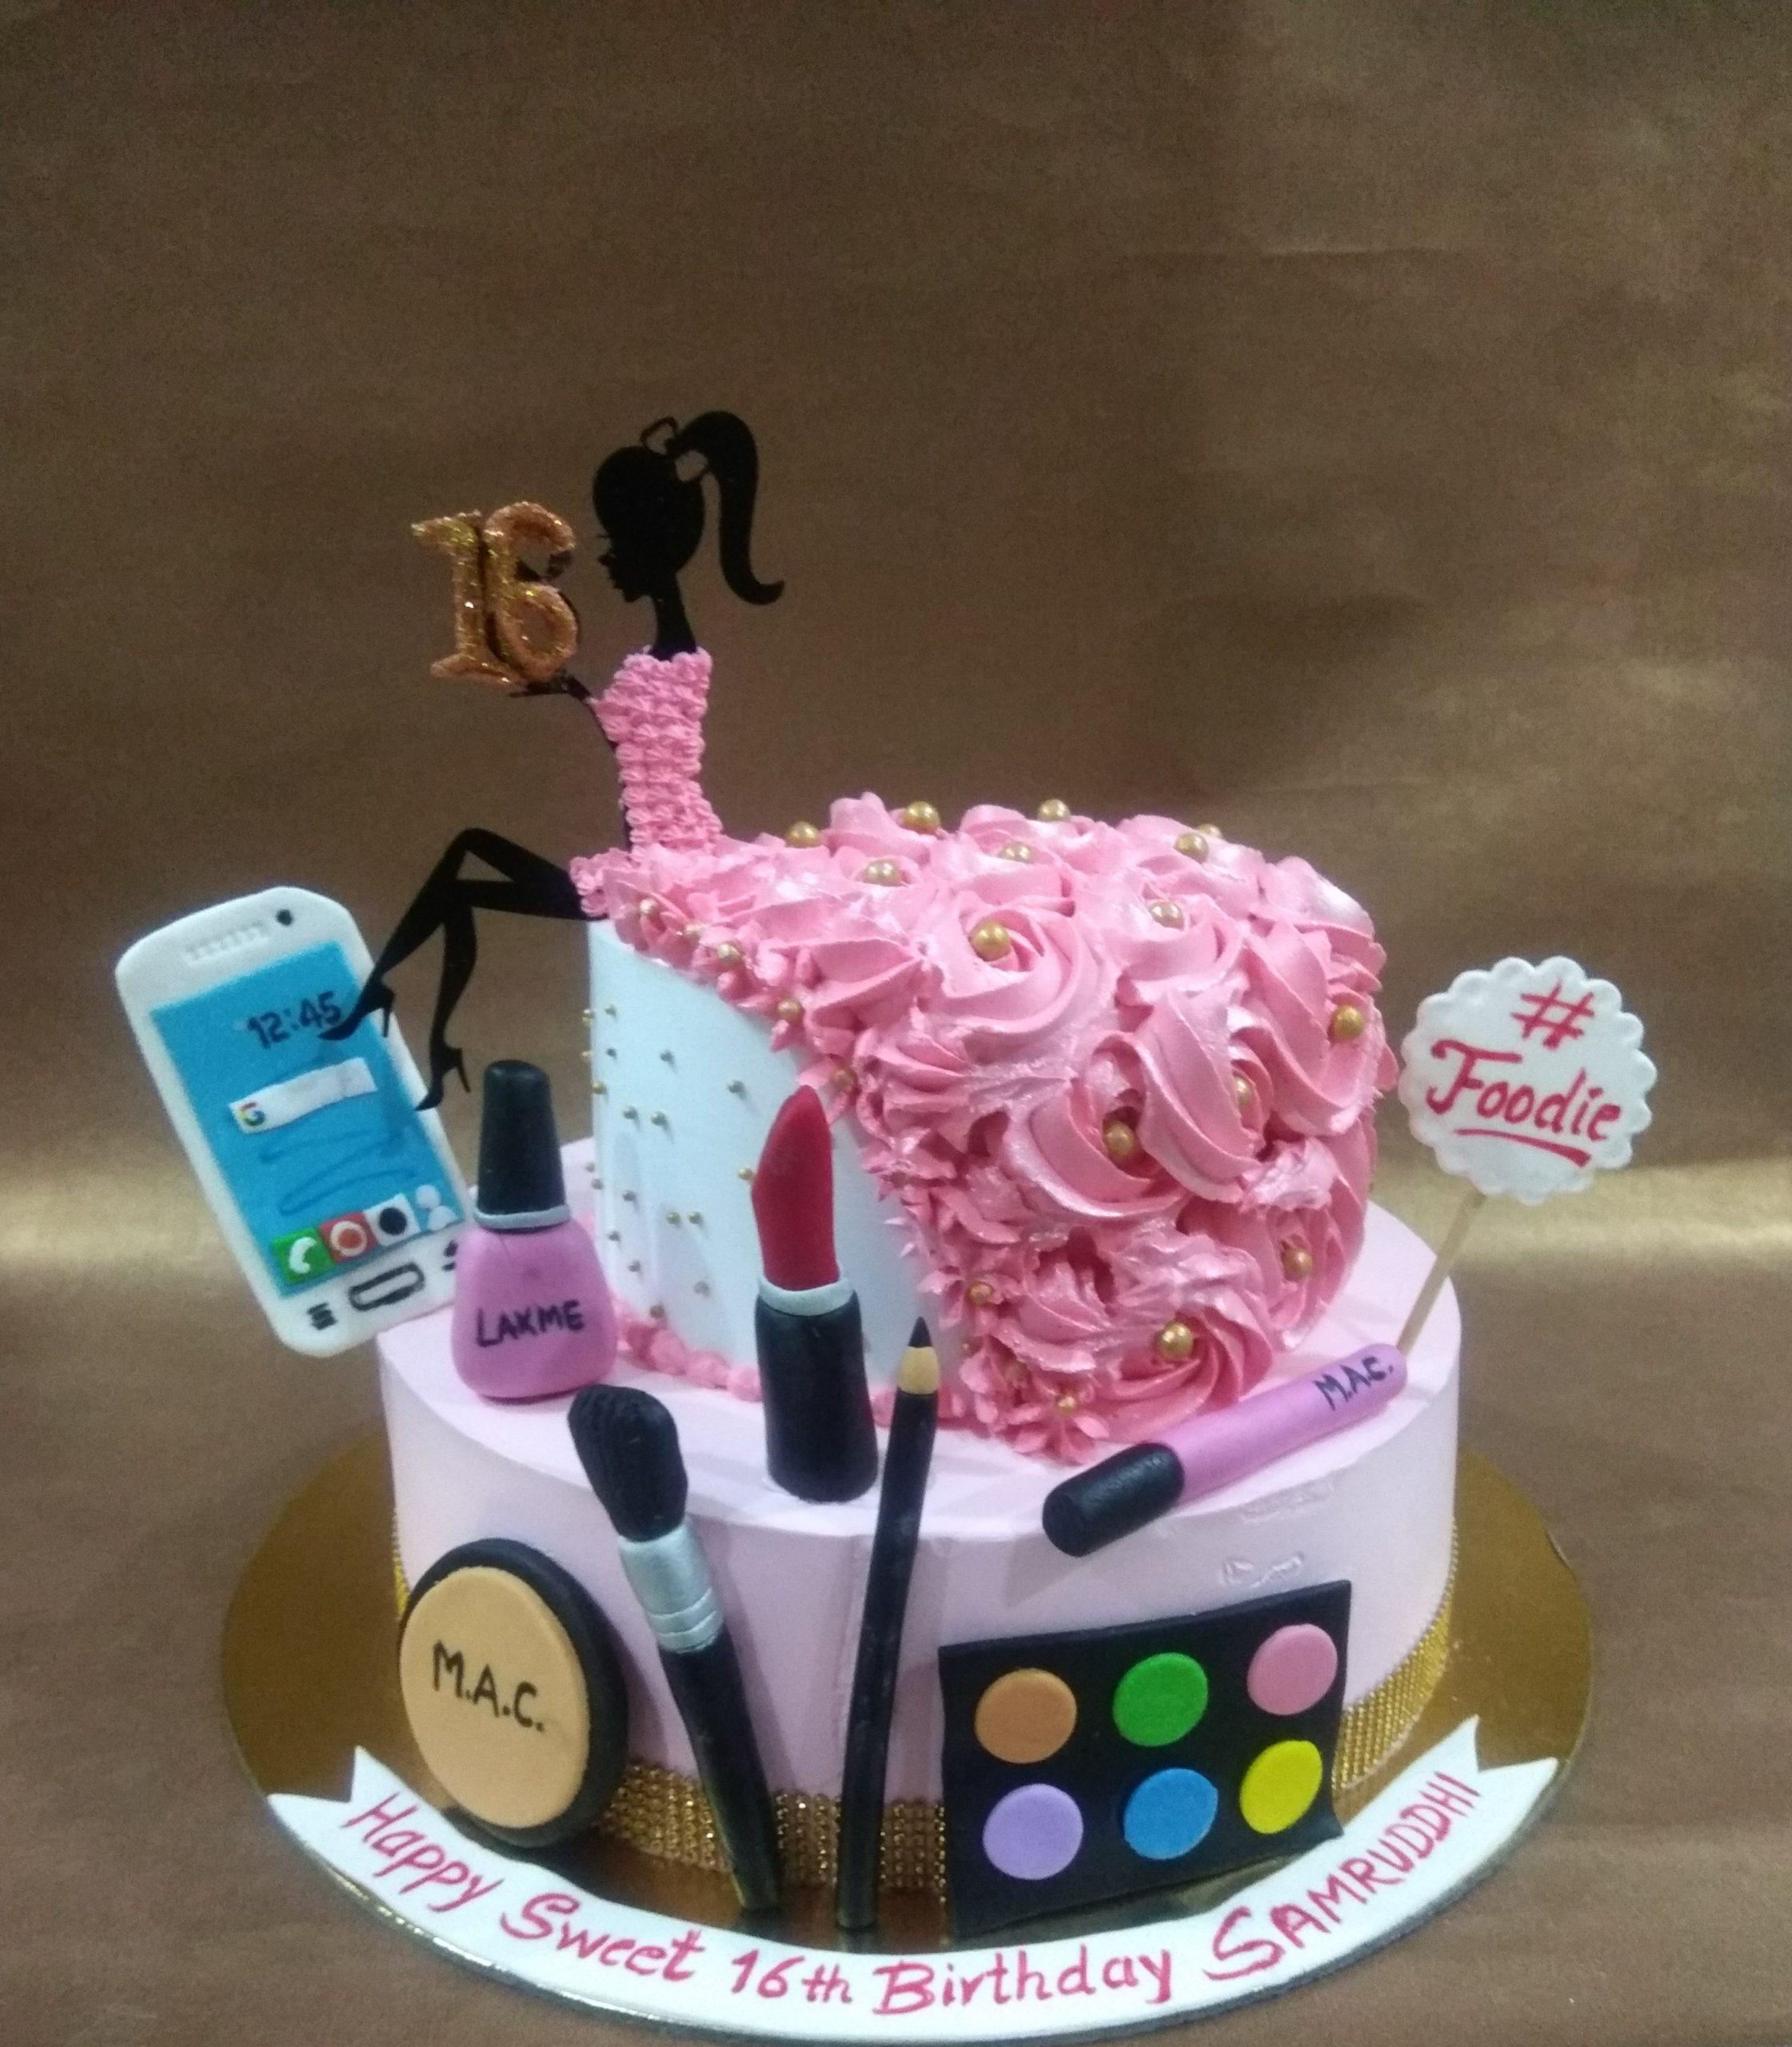 Make Up Theme Cake Designs, Images, Price Near Me